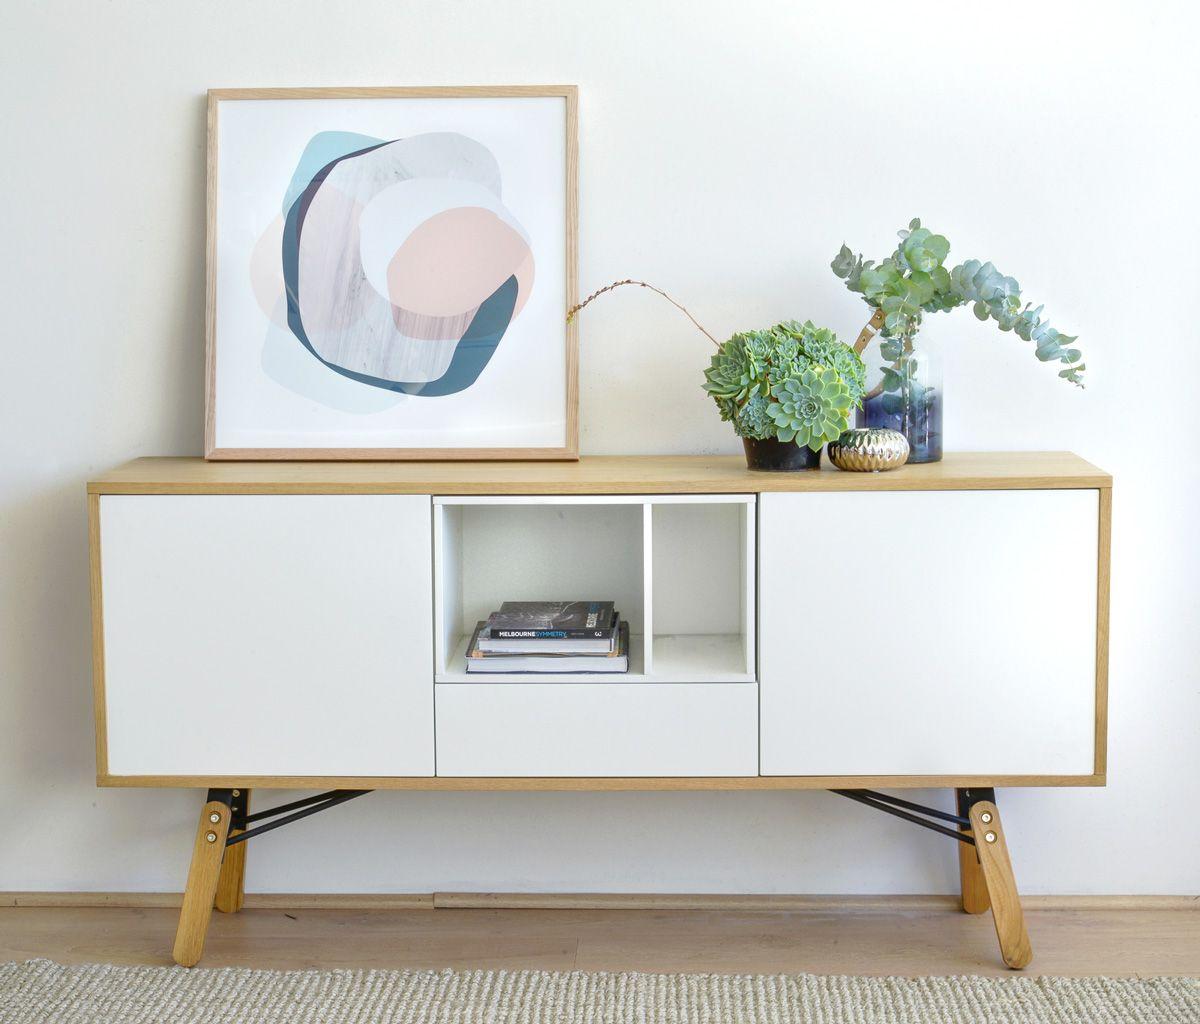 Zeno Scandinavian Sideboard Buffet Cabinet Interior Secrets Scandinavian Style Furniture Sideboard Styles Scandinavian Style Sideboard